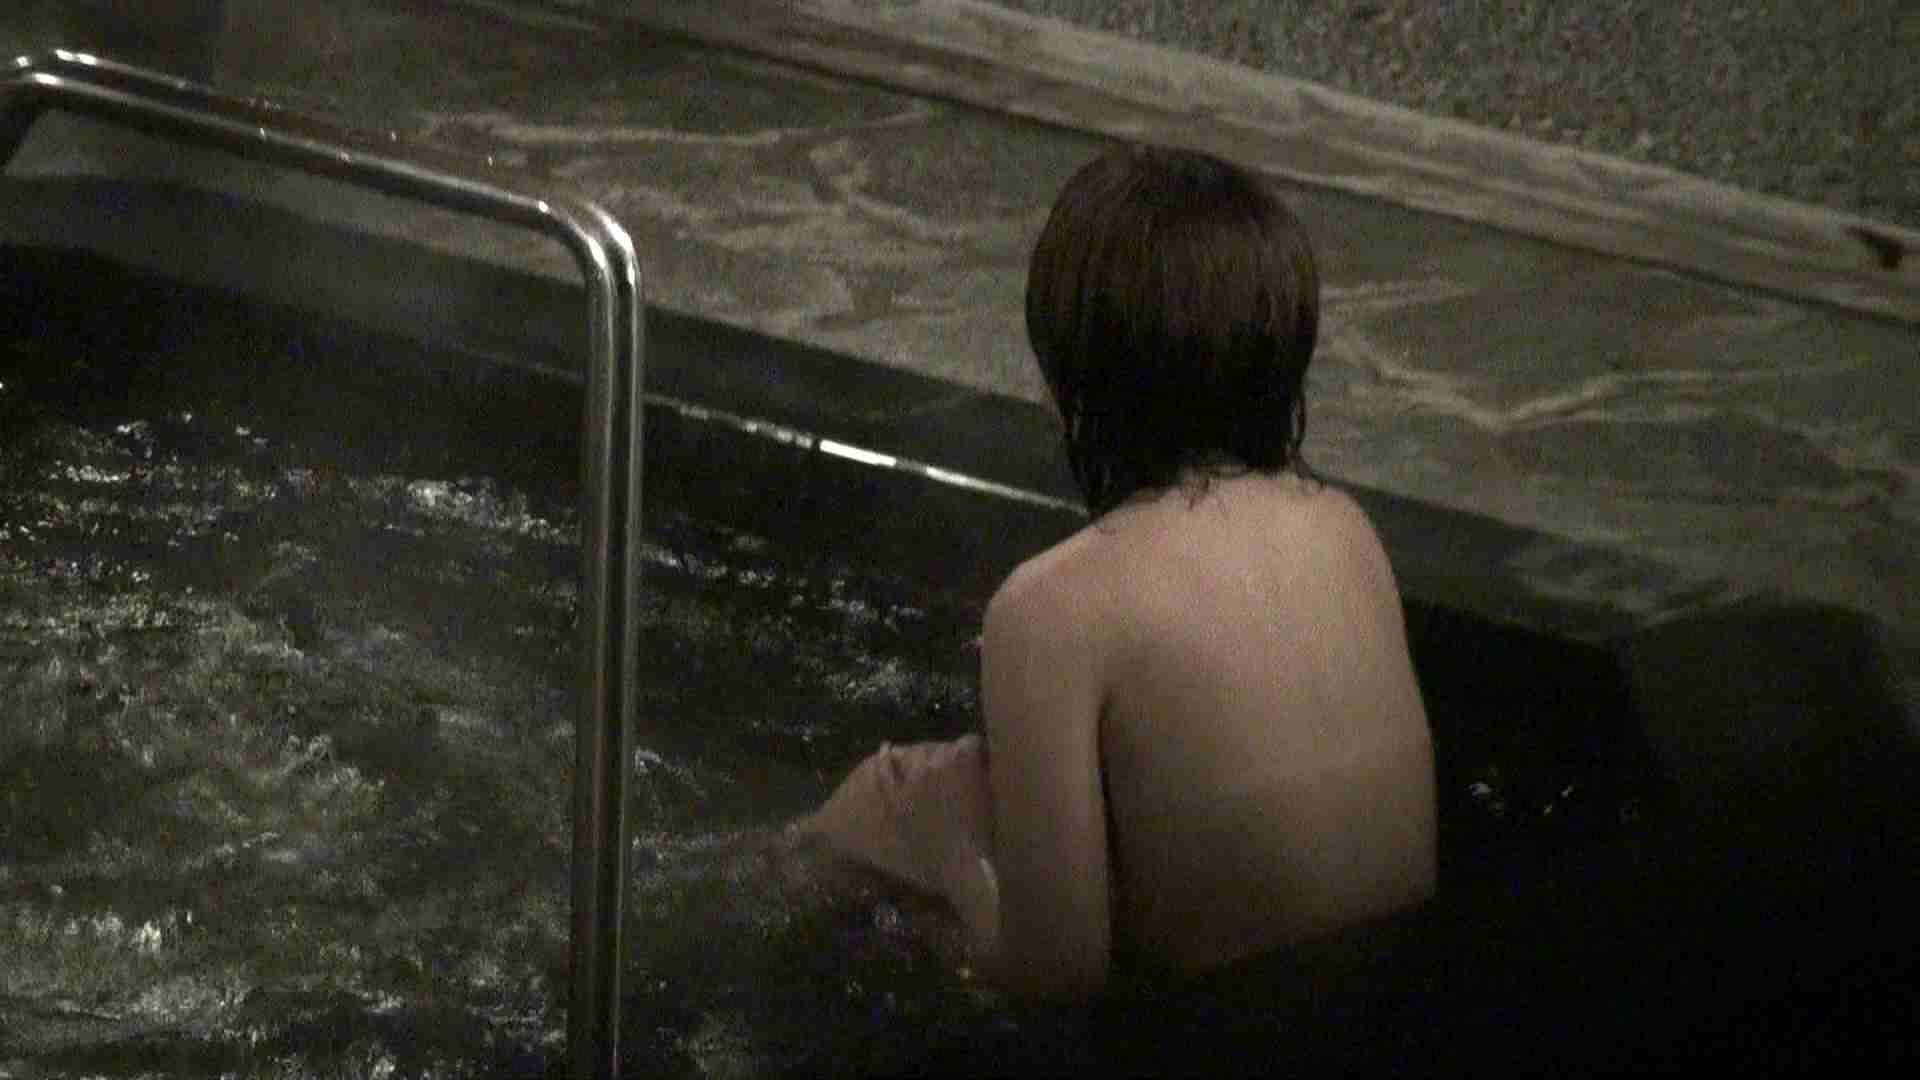 Aquaな露天風呂Vol.411 OLのエロ生活   露天風呂  79連発 10